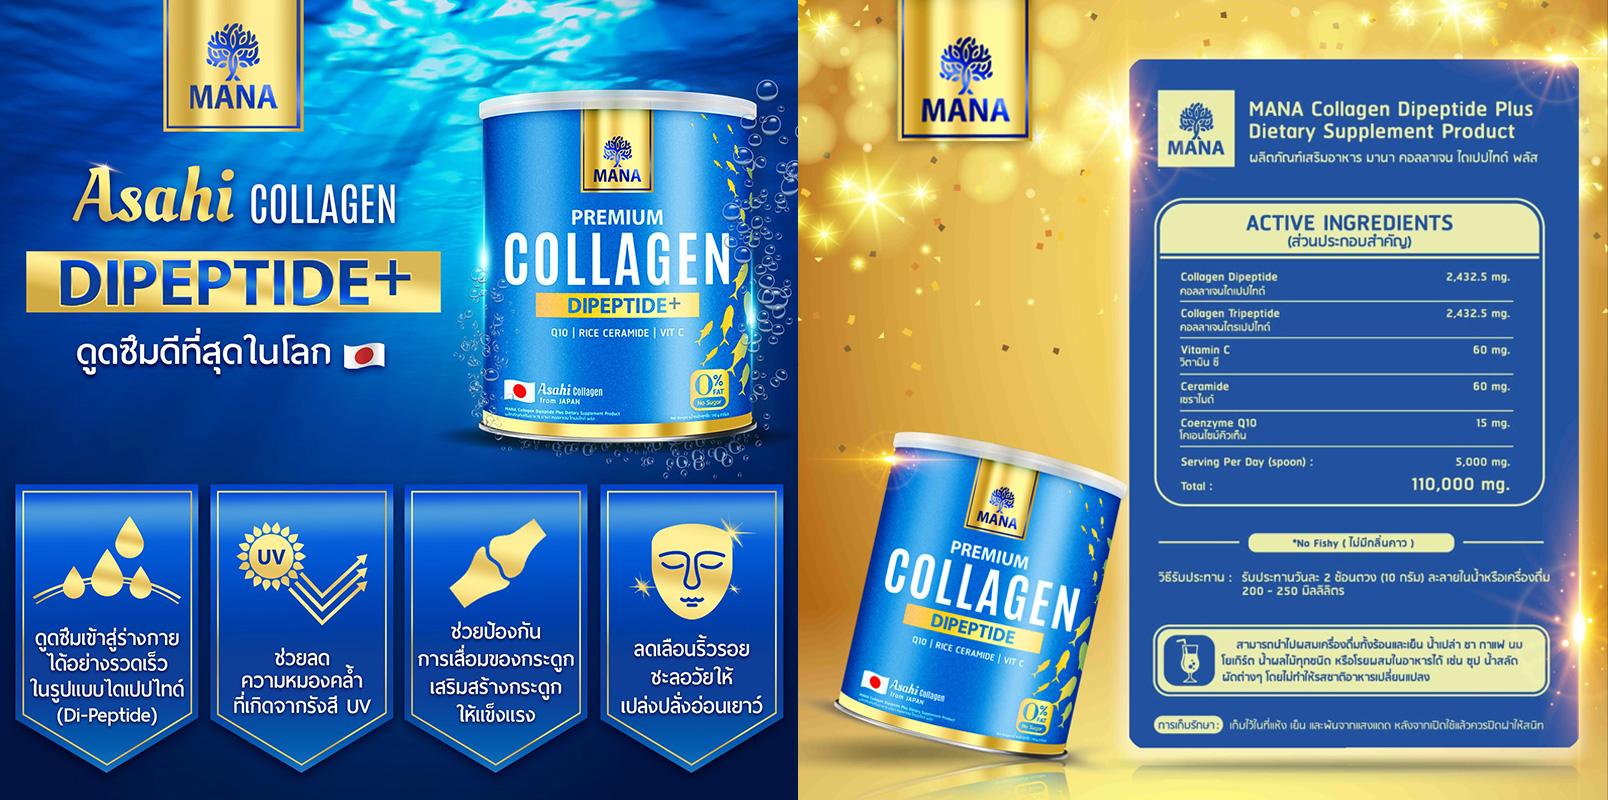 Mana Collagen Asahi Dipeptide นวัตกรรมใหม่ ที่สุดแห่งการบำรุงผิว เป็นคอลลาเจนอันดับ 1 จากประเทศญุ่ปุ่น